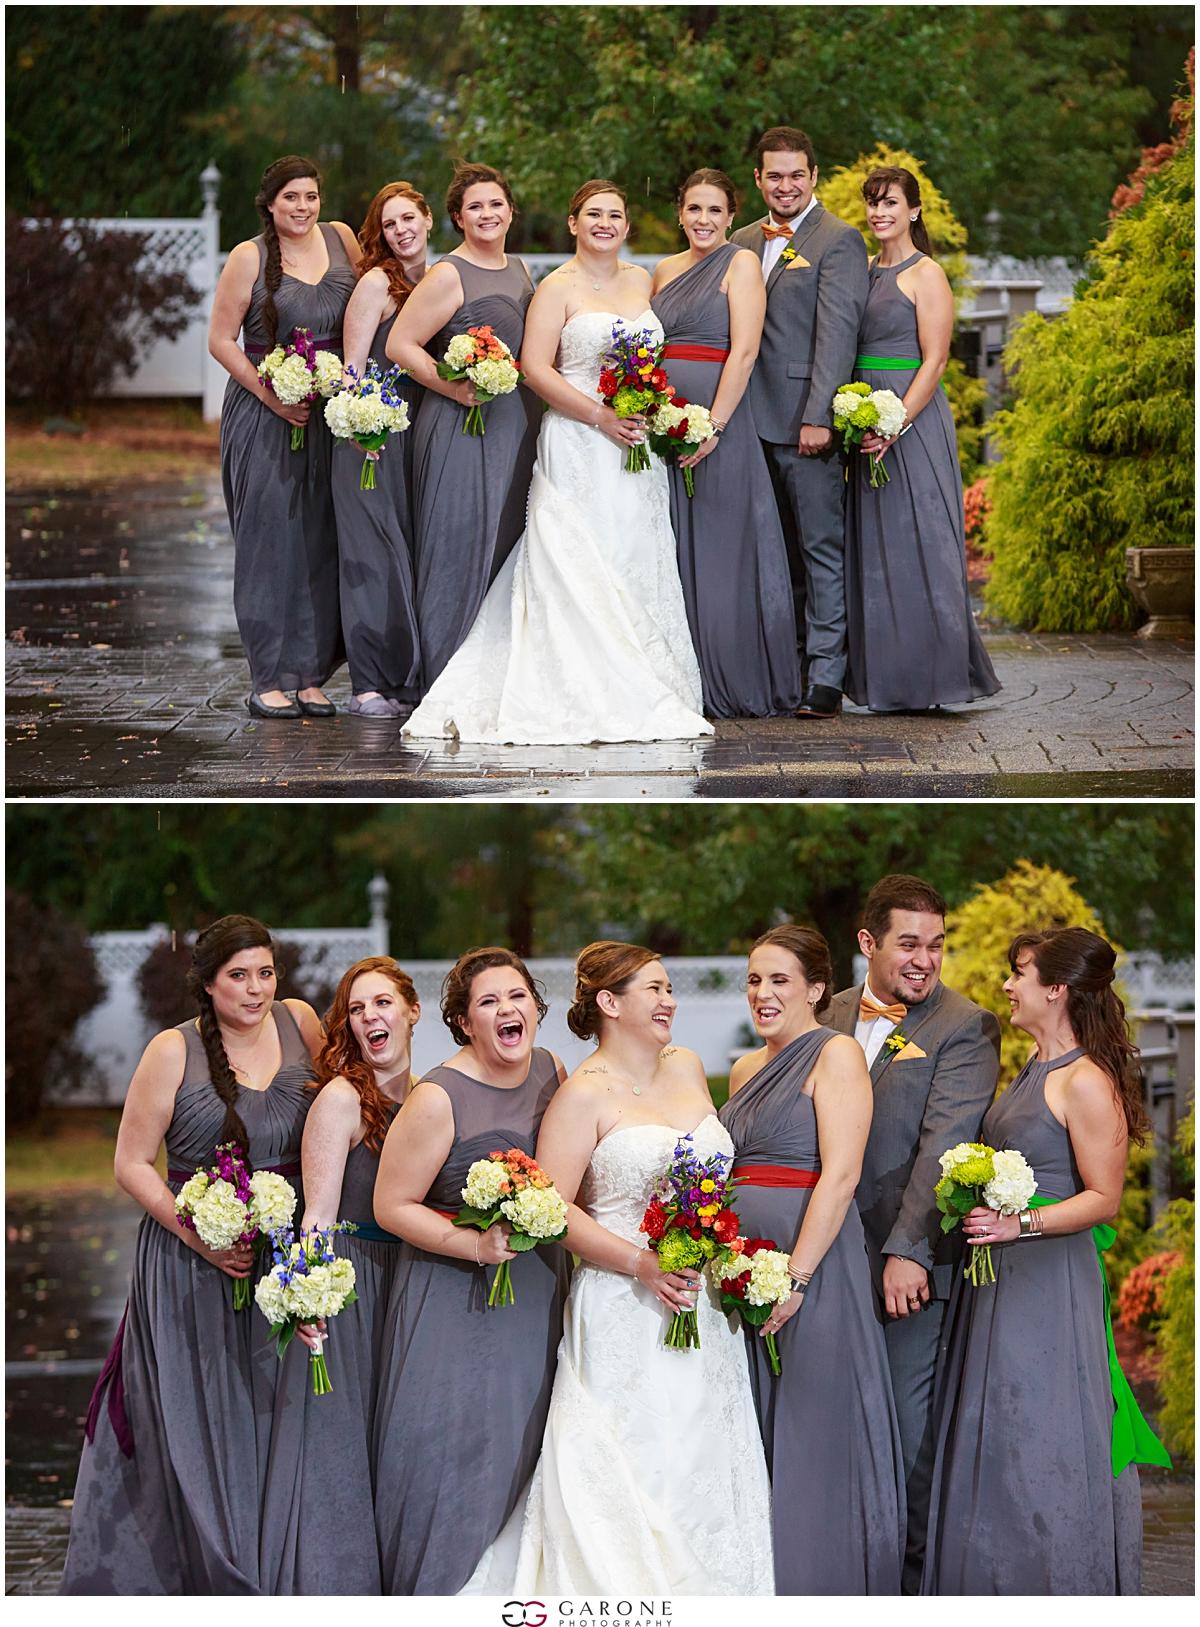 Jenna_Nicole_Castleton_Wedding_Love_is_love_NH_Wedding_Photographer_Garone_Photography_0023.jpg